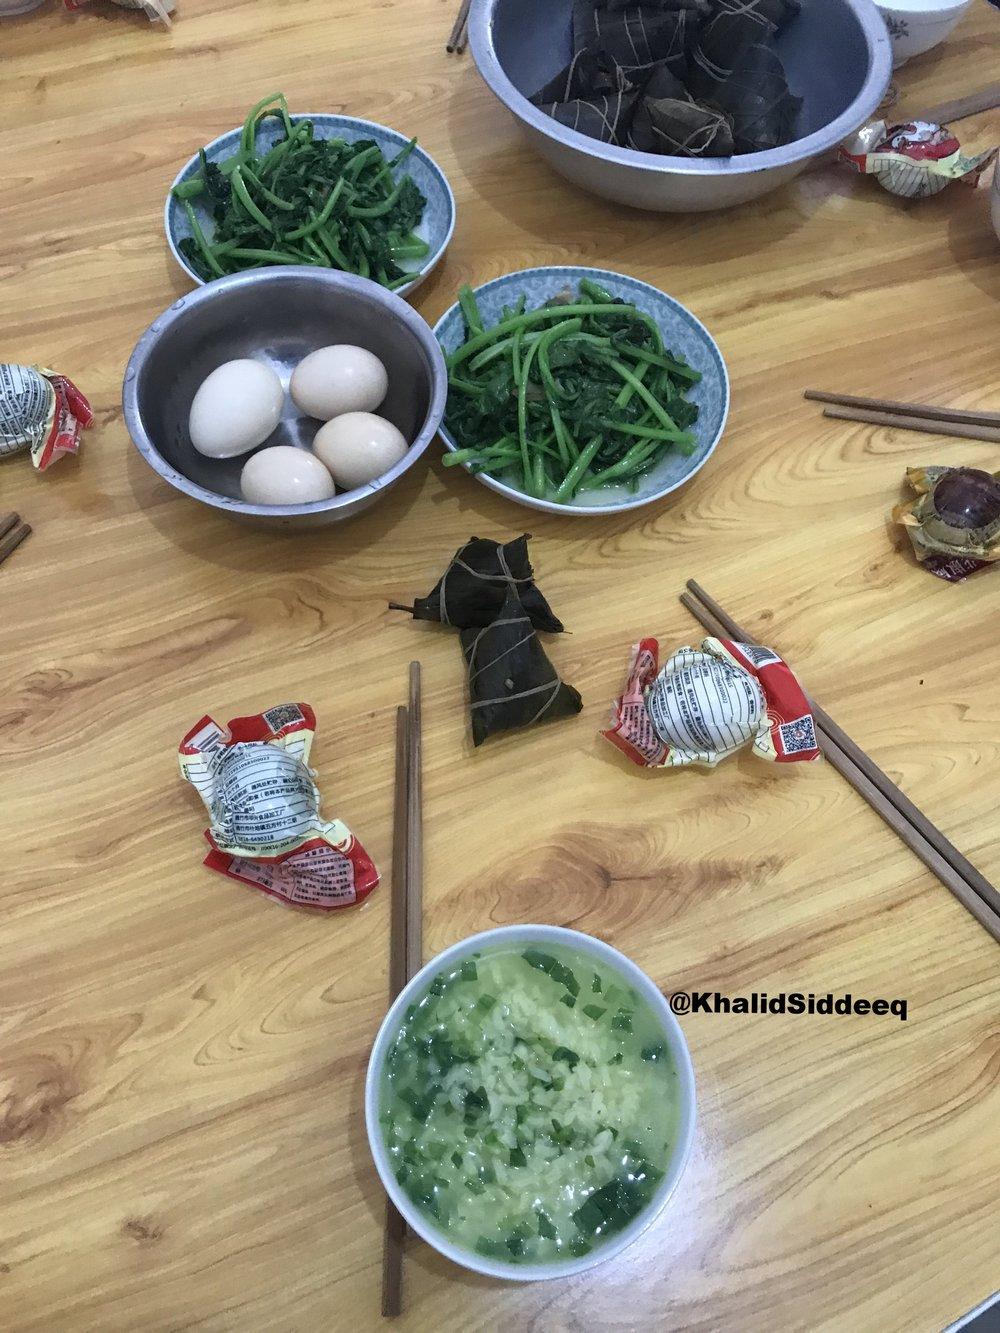 早餐 وجبة الإفطار - وهي وجبة صينية غذائية متكاملة الصفات، فيها من البروتينات والفوائد من يكفي لتقوم بأي عمل شاق